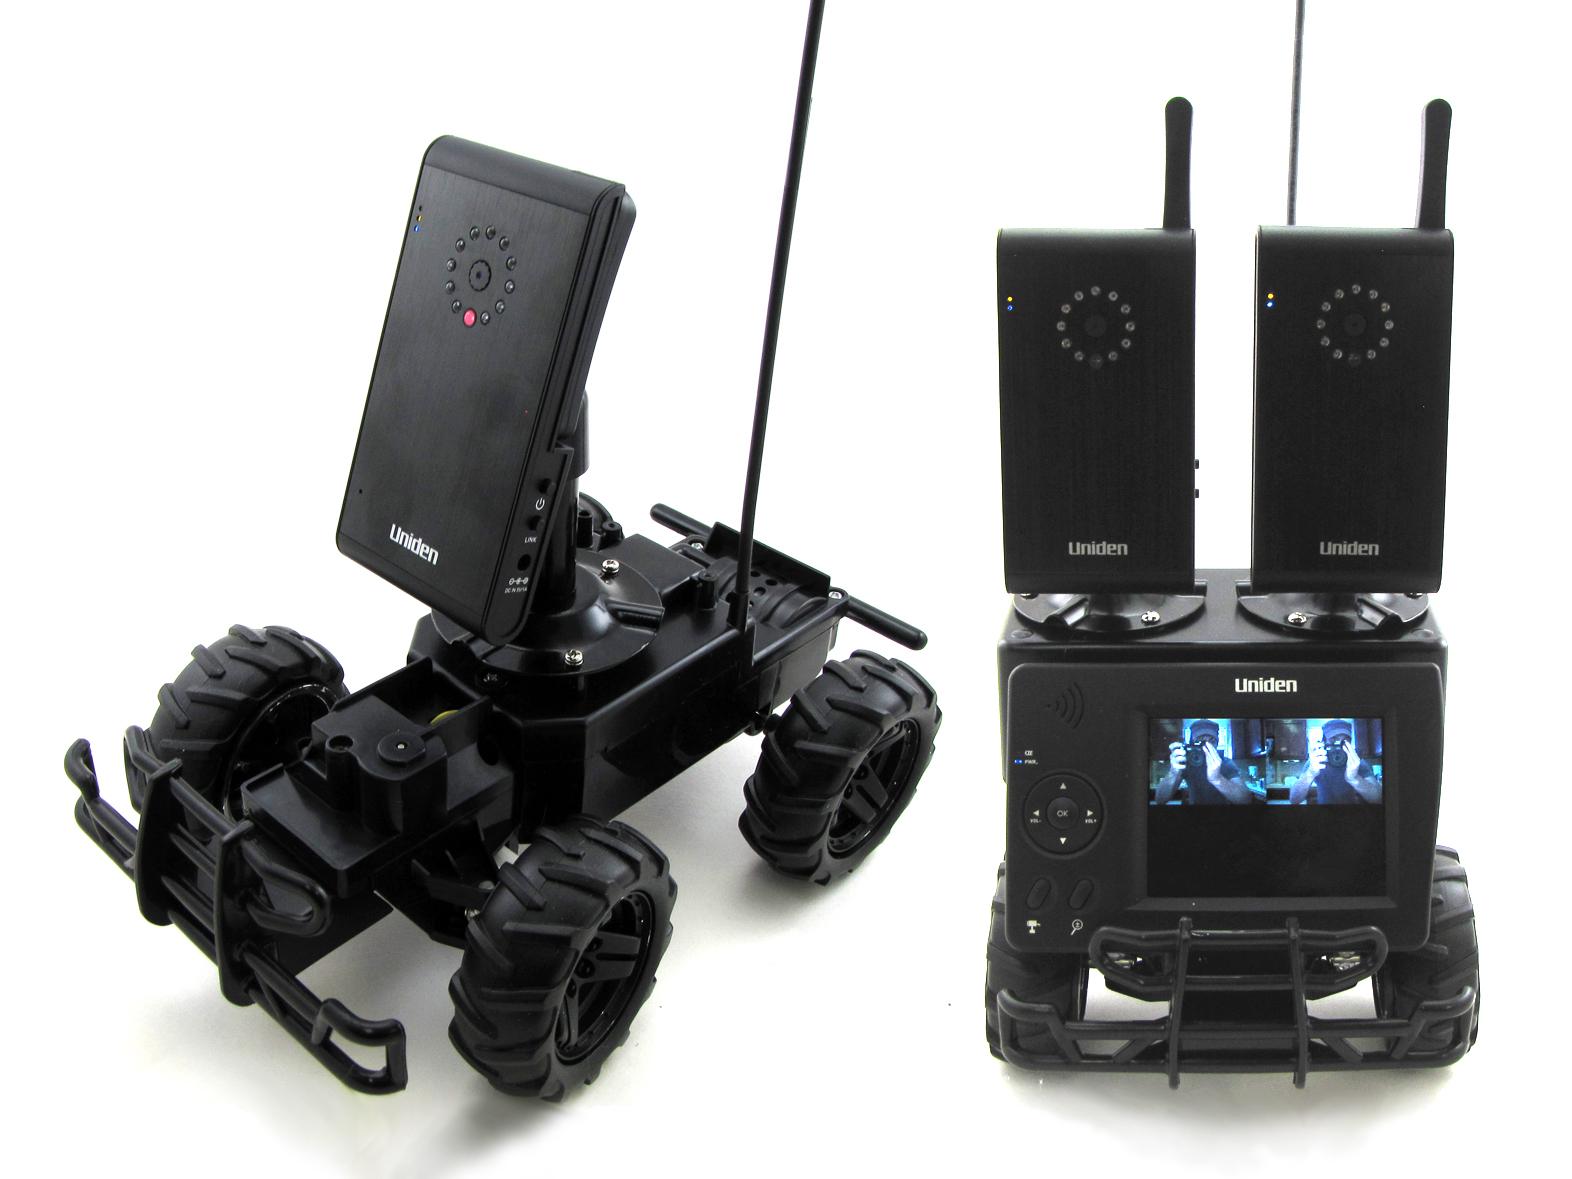 New Project: Mini RoverRedux